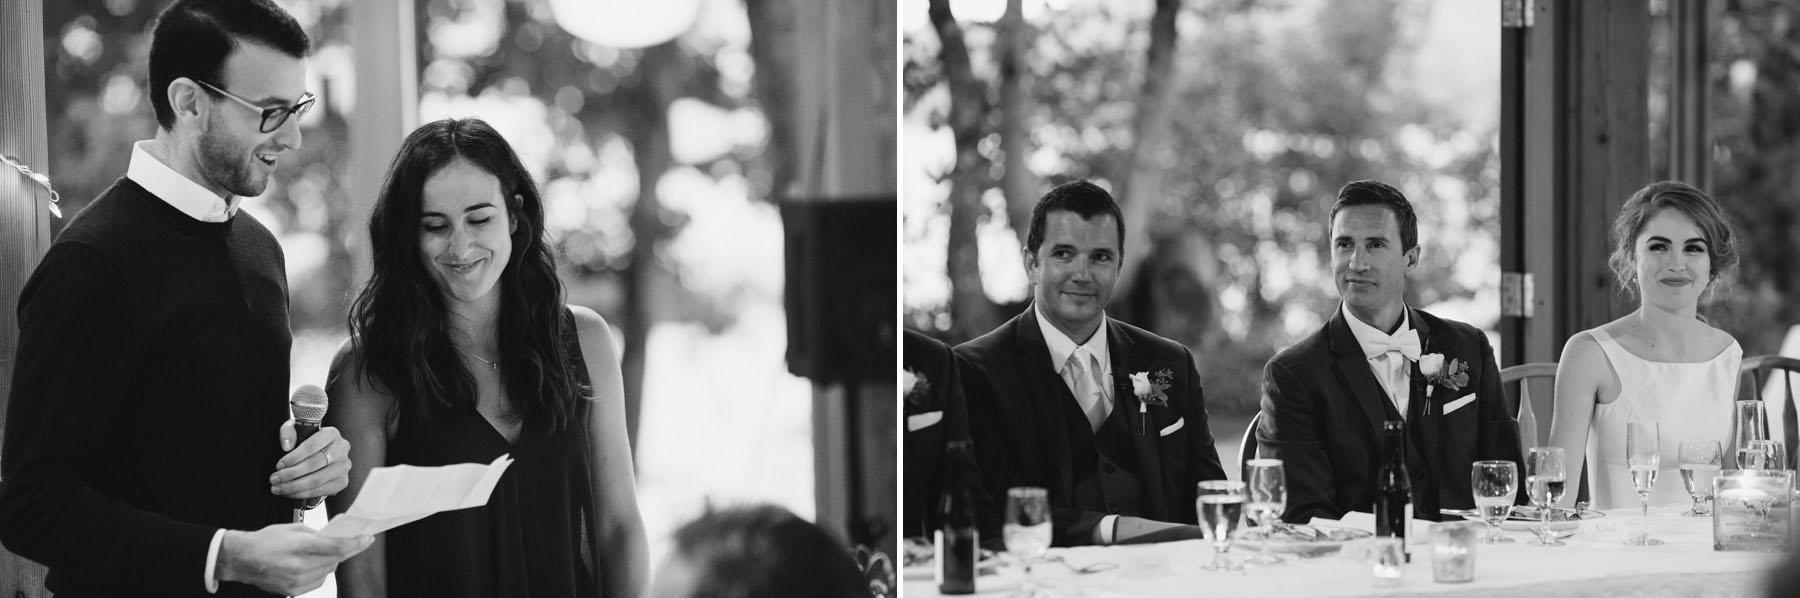 thetis-island-wedding-photographer-rp-rn-165.jpg